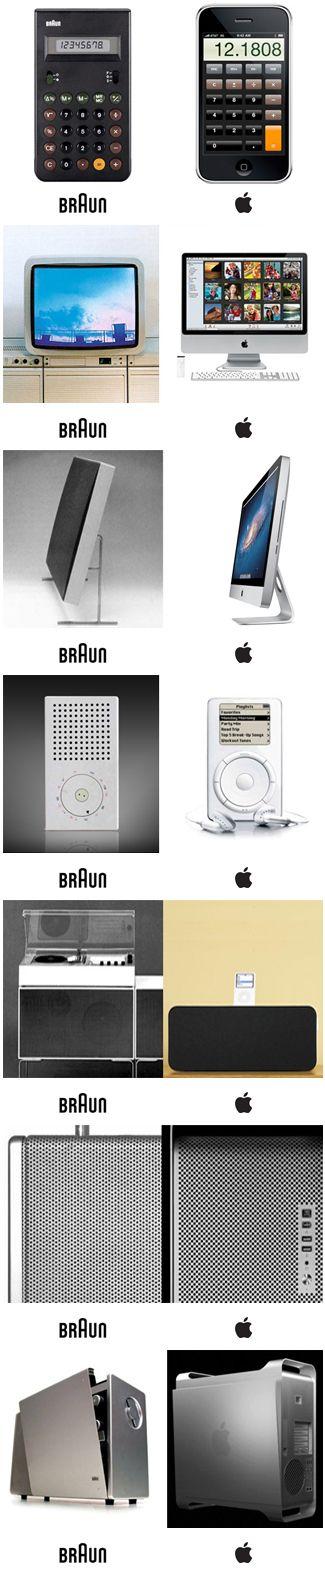 braun apple jonny loves dieter istolen apple braun design pinterest love apples and. Black Bedroom Furniture Sets. Home Design Ideas